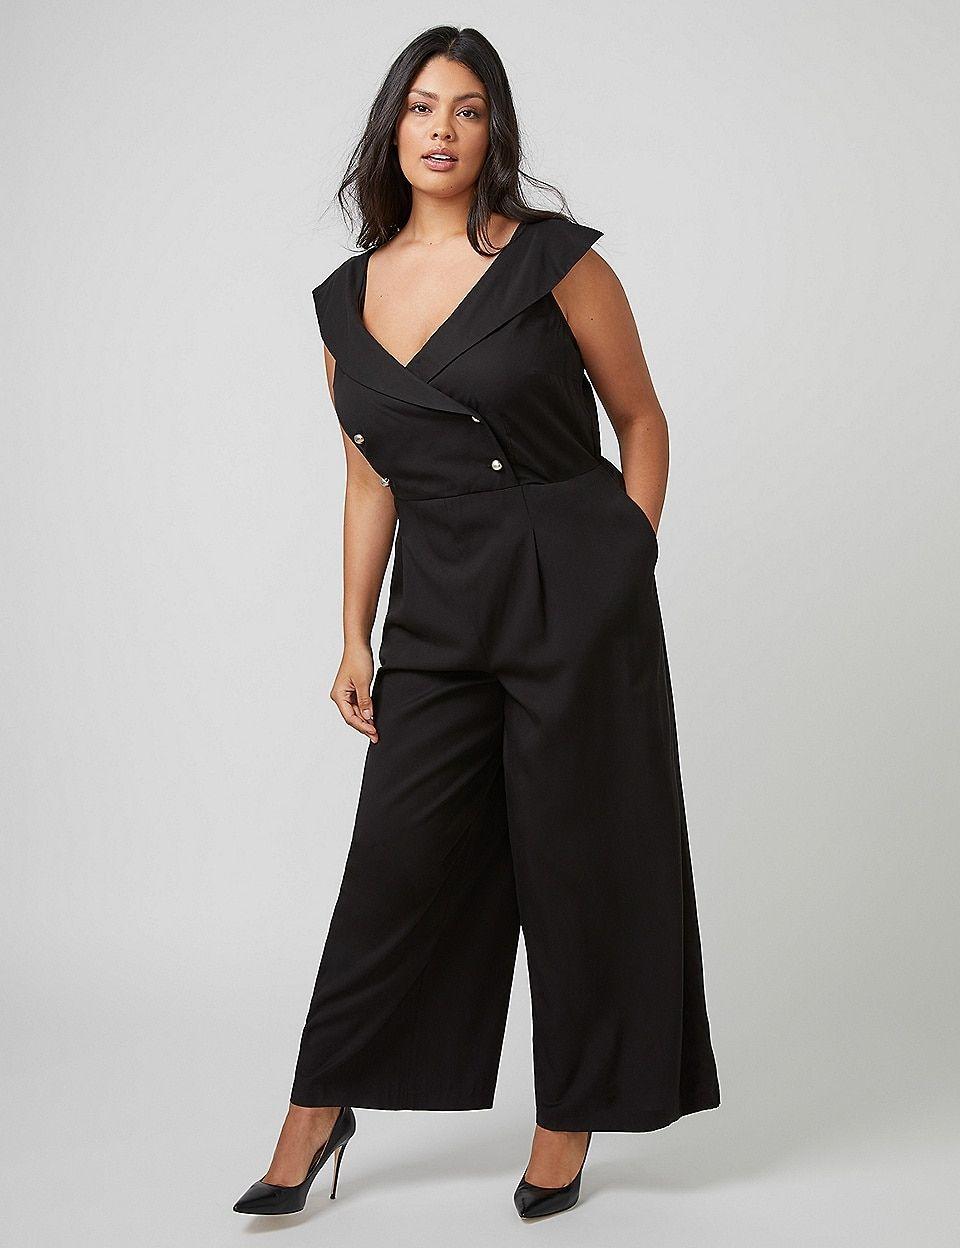 4c14ff908 Pin by Melanie Harris on CLOTHING ~ FOOTWEAR ~ ACCESSORIES ...